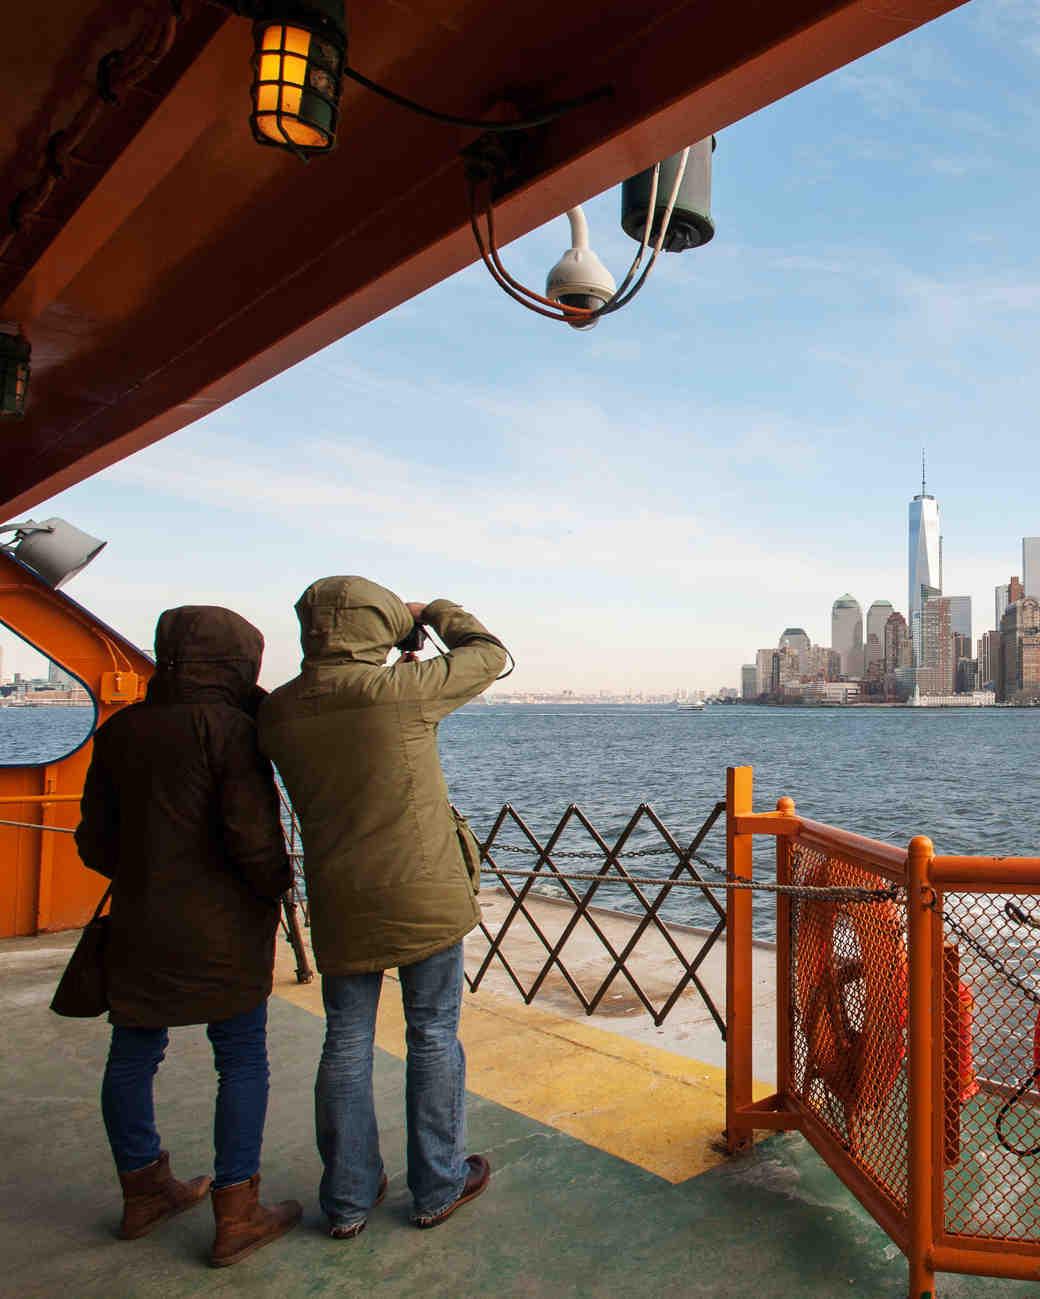 nyc-proposal-spot-staten-island-ferry-view-of-manhattan-skyline-1114.jpg